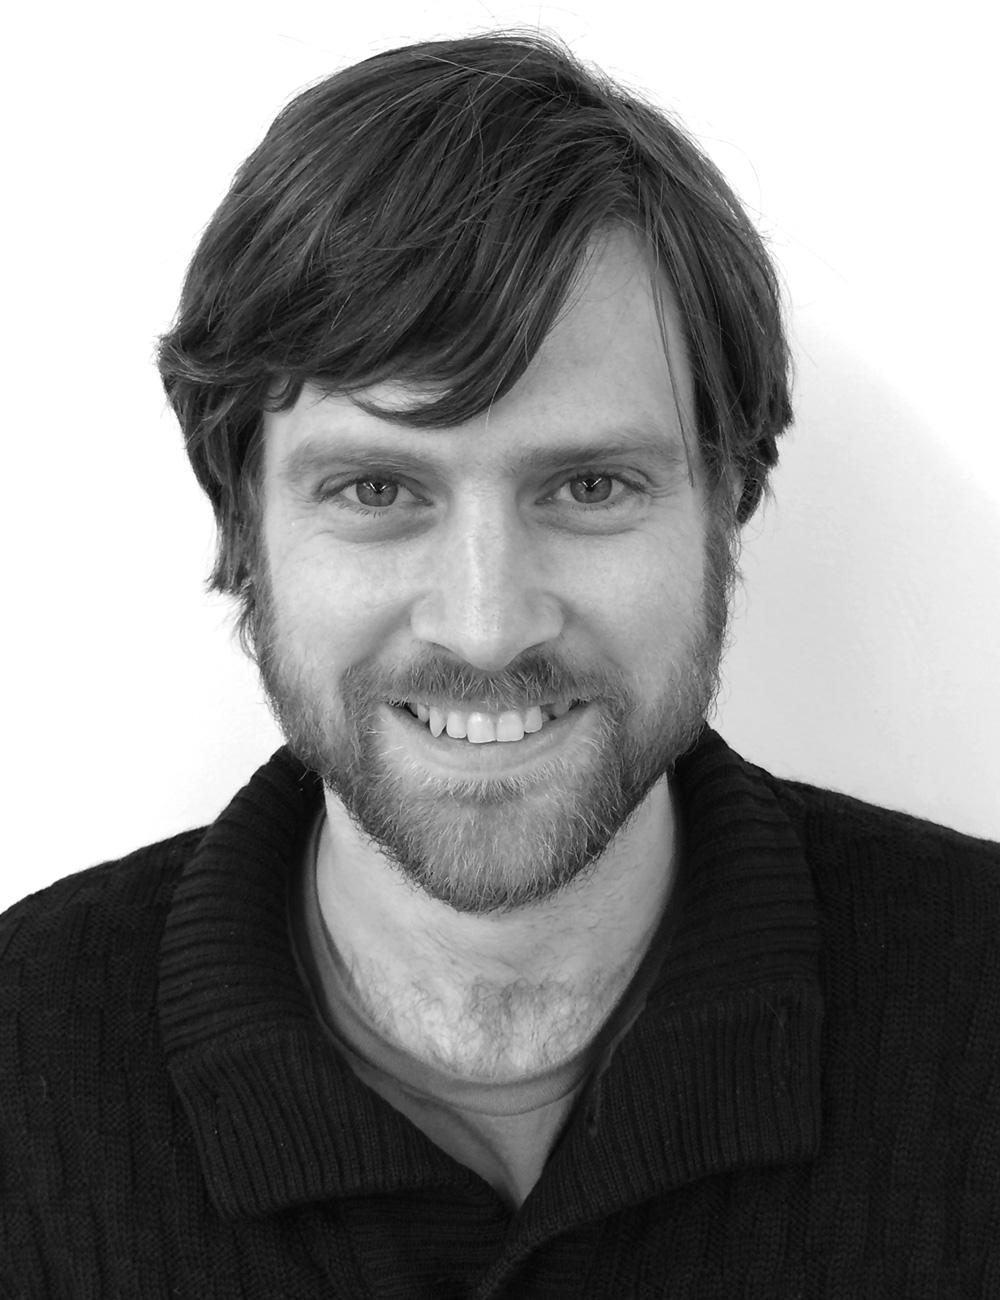 Erik Brett Jacobsen  Arkitekt MNAL MBA / Kontorleder Oslo, Partner +47 416 05 889  erik.jacobsen@kontur.as